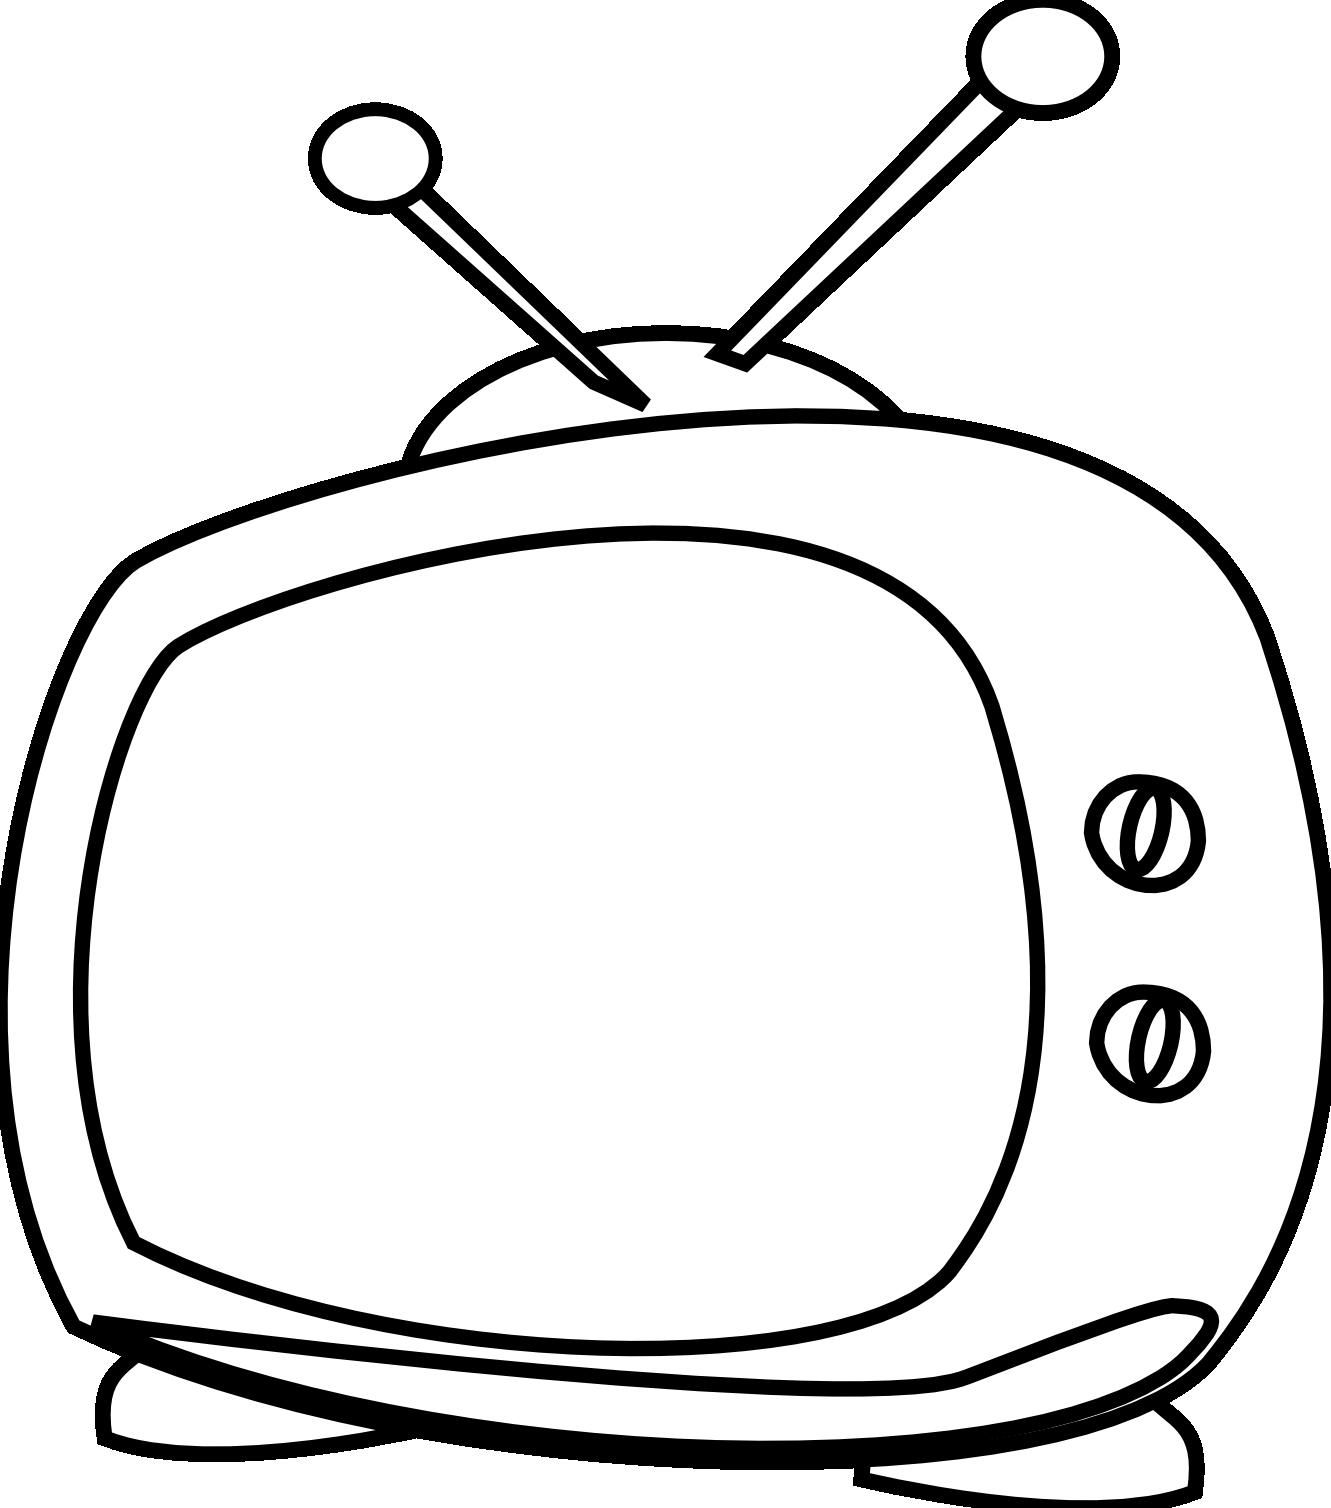 Television clipart watch movie. Cartoon tv black white